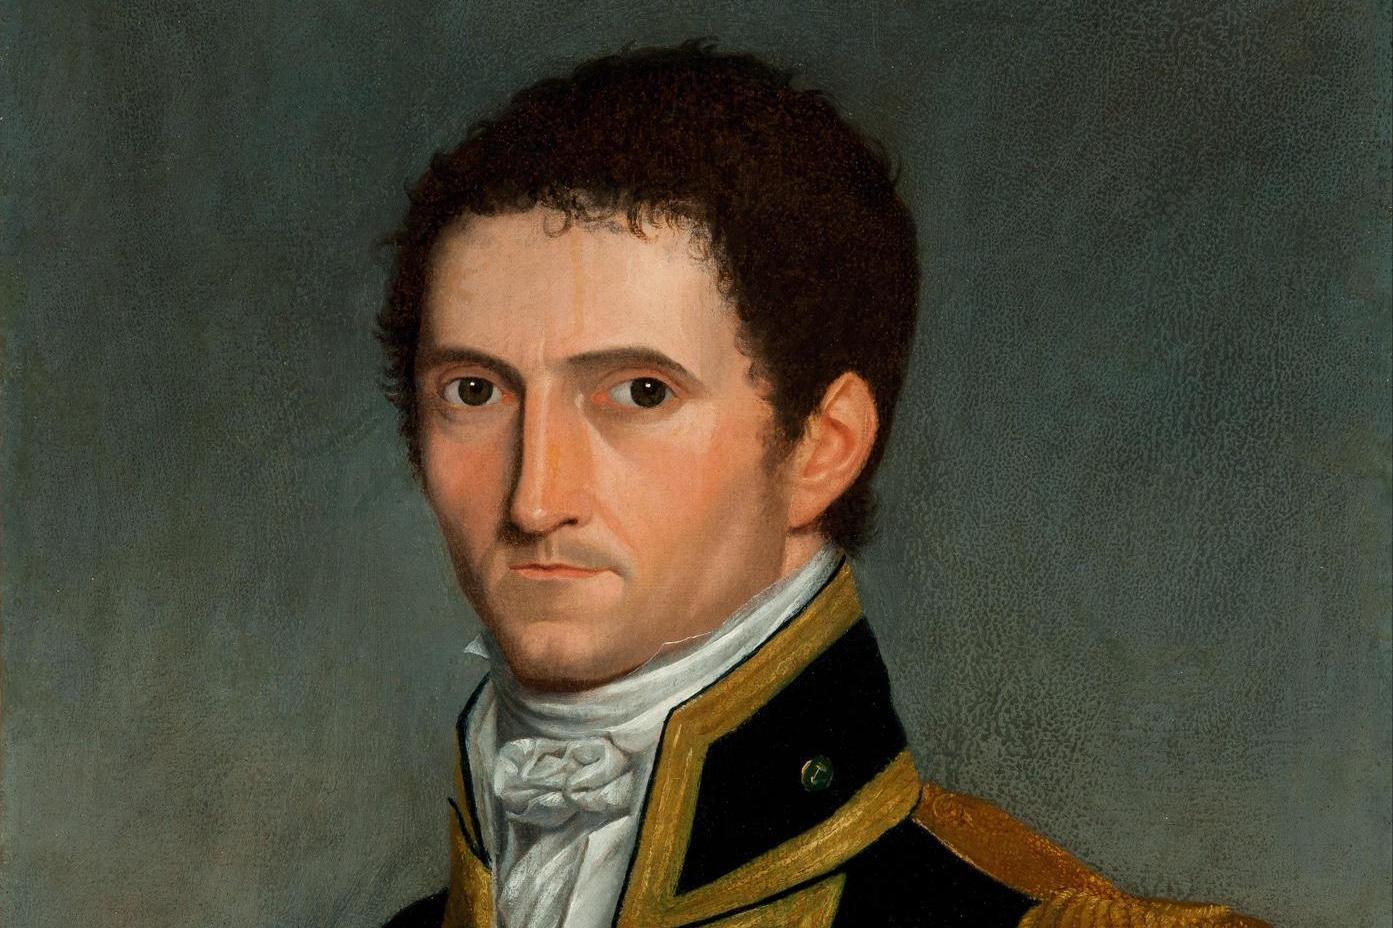 Captain Flinders was the first man to circumnavigate Australia